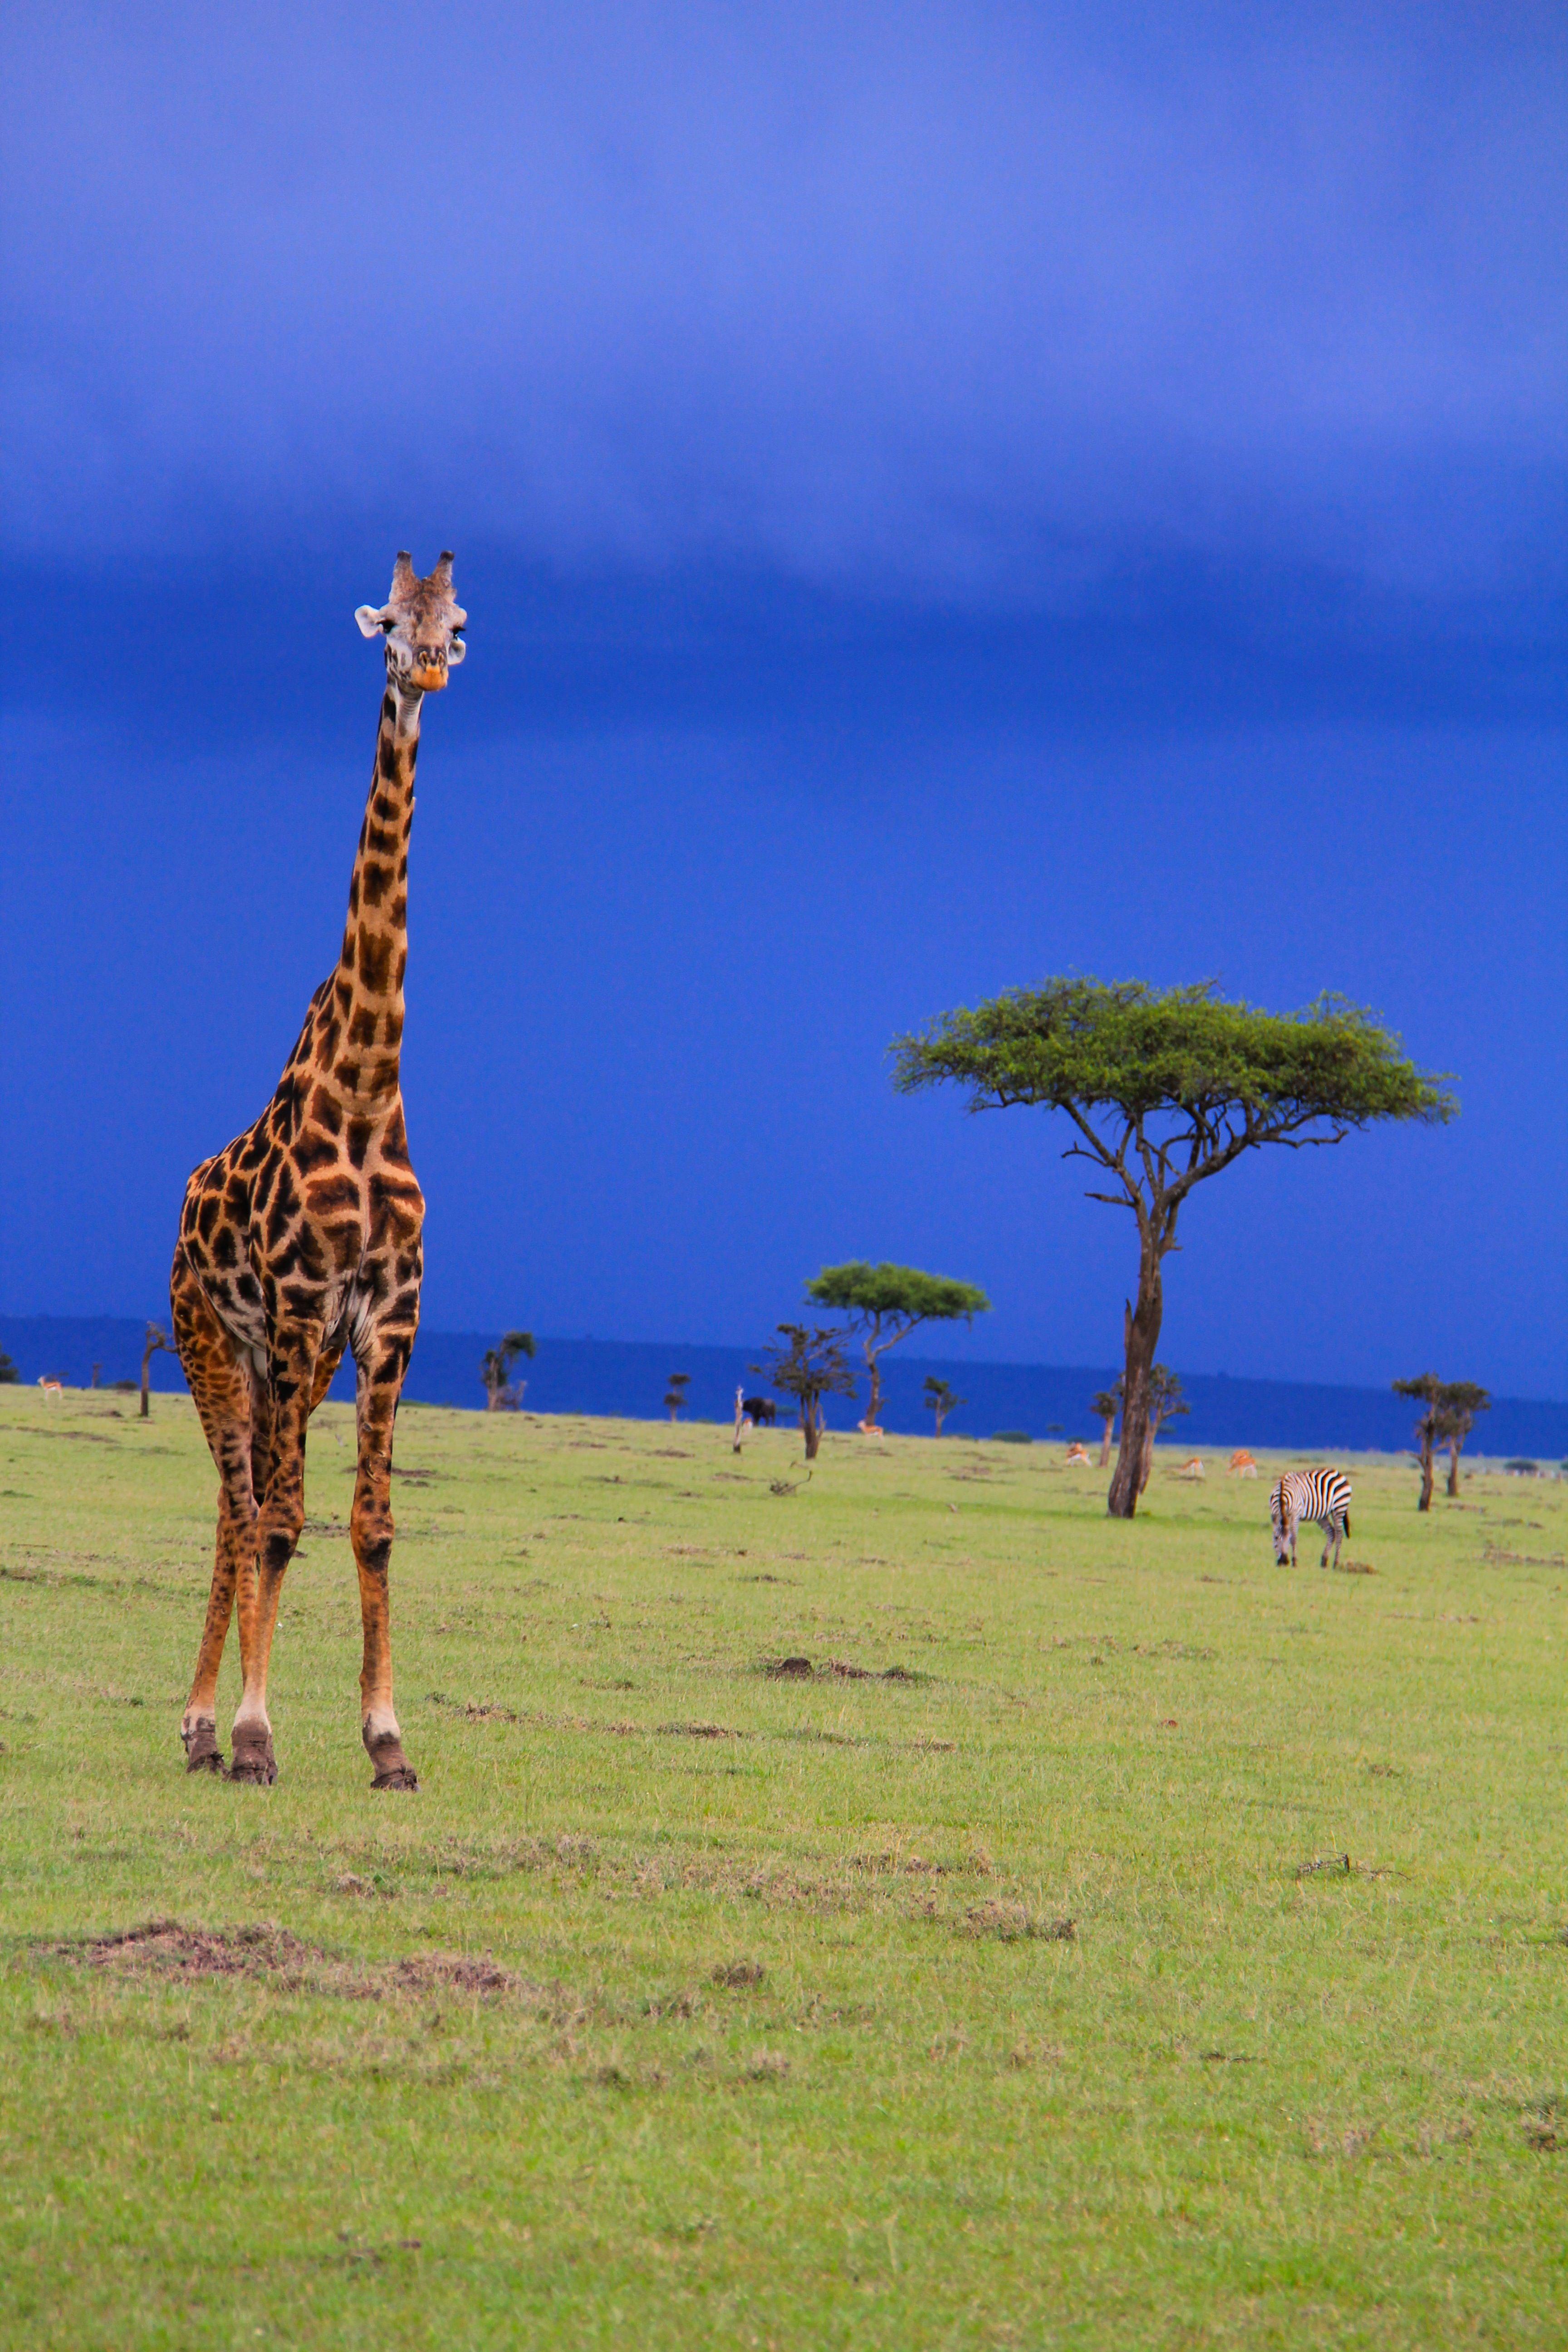 Giraffe maasai mara before the rain storms